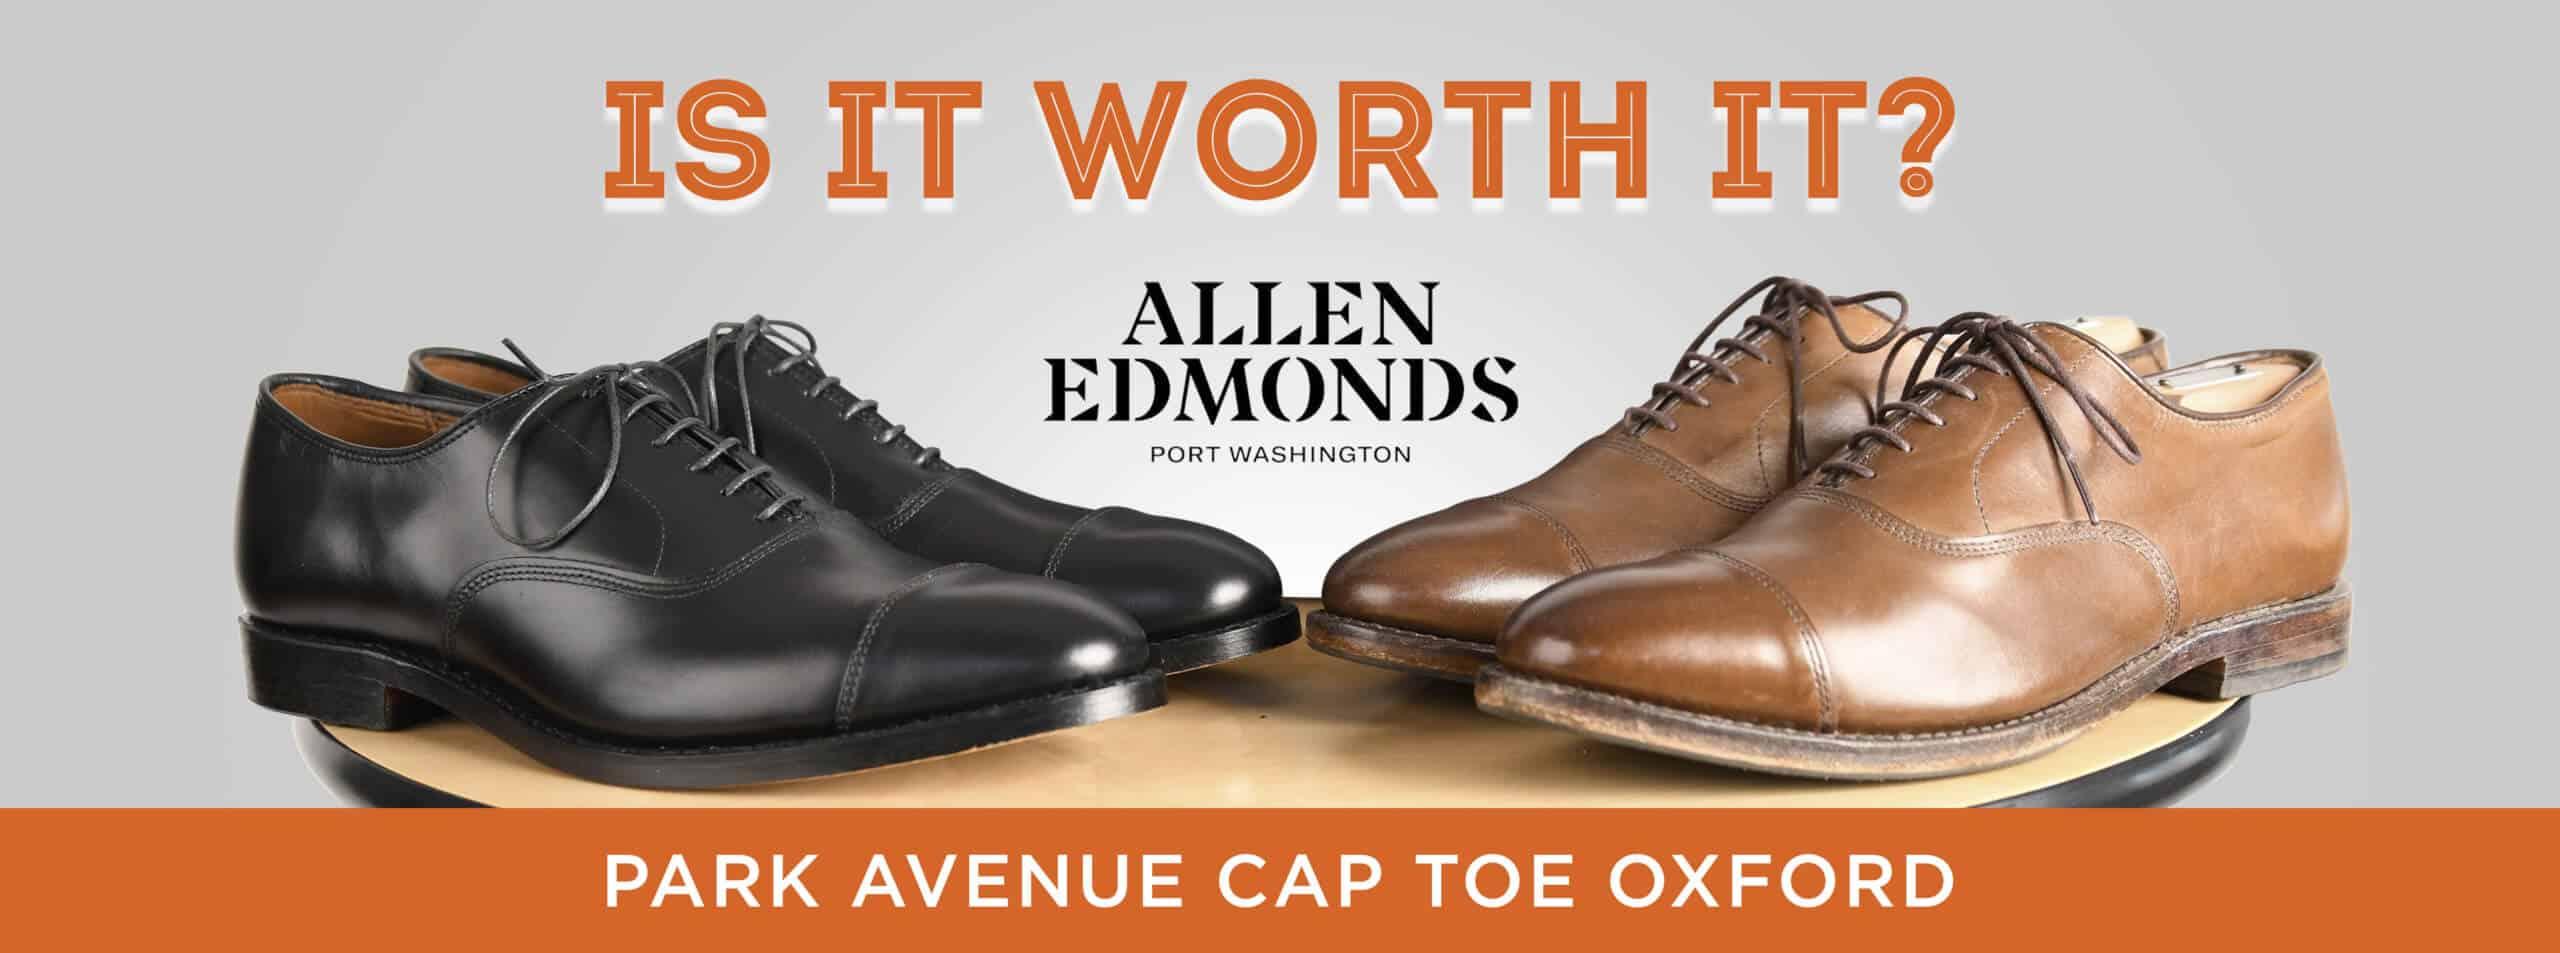 Allen Edmonds Park Avenue Cap Toe